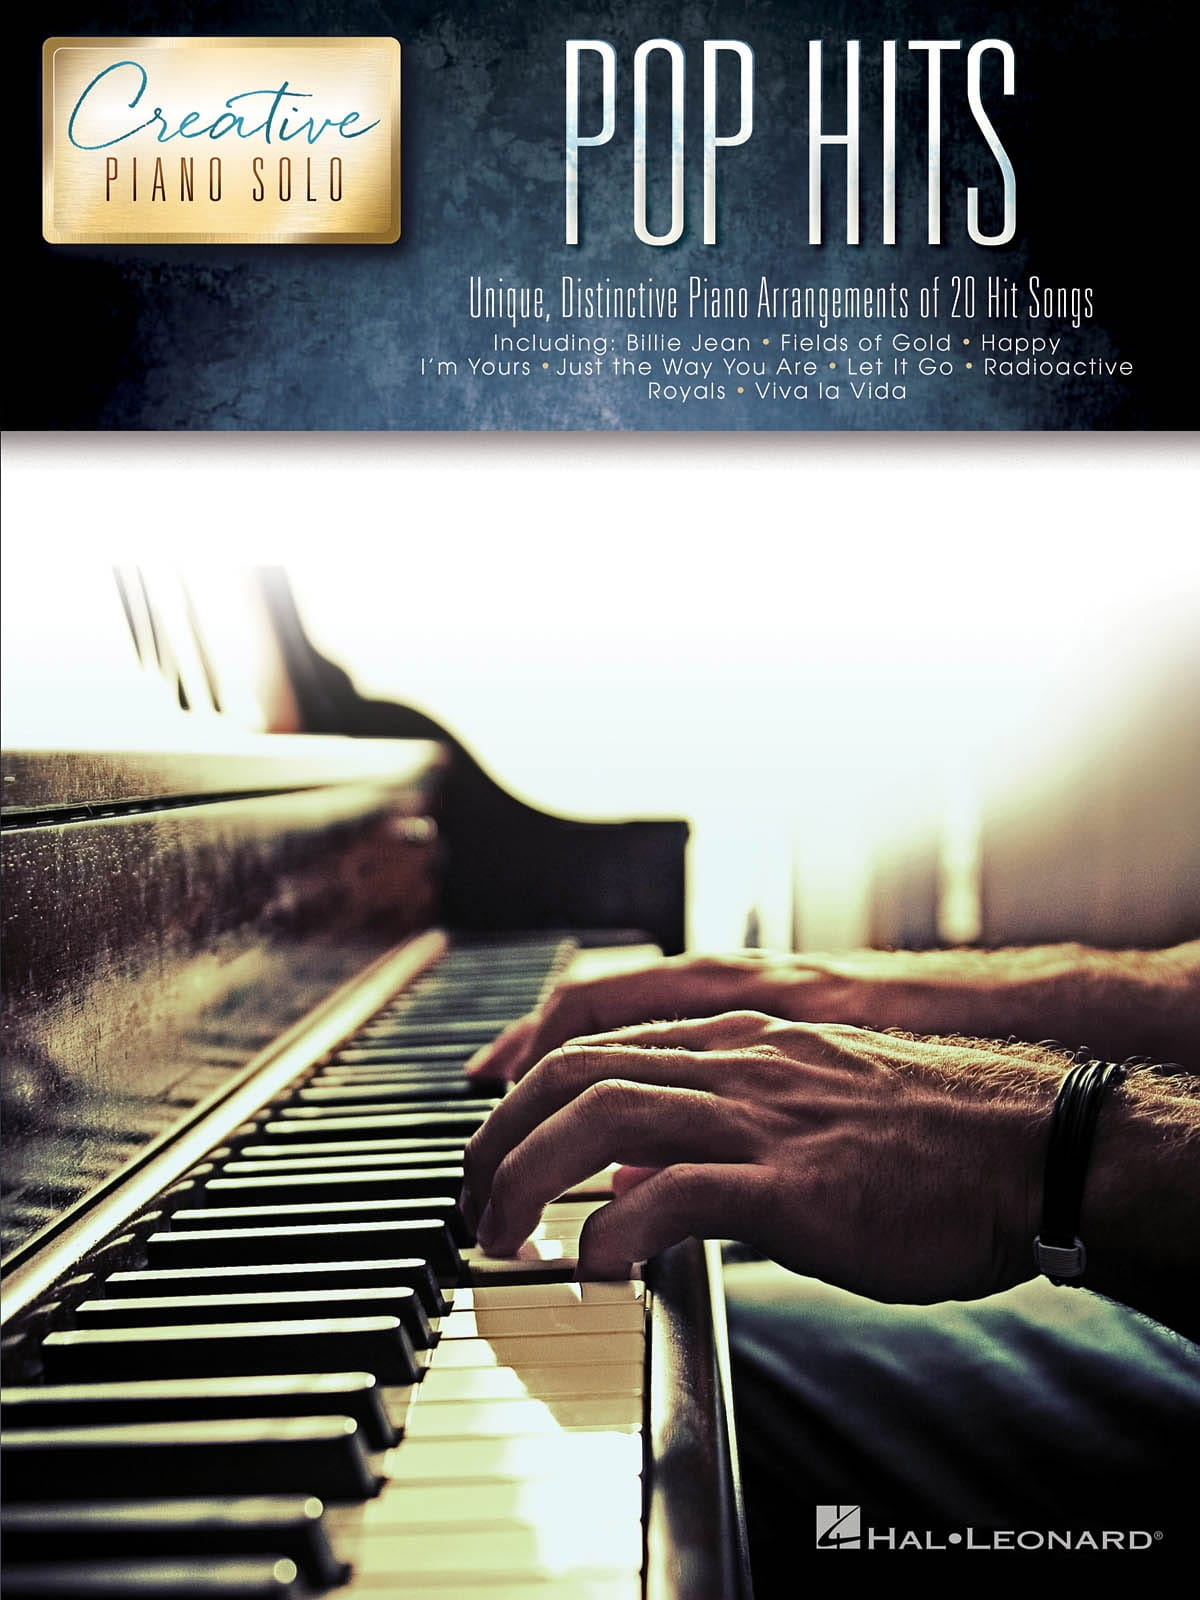 Creative Piano Solo - Pop Hits - Partition - laflutedepan.com